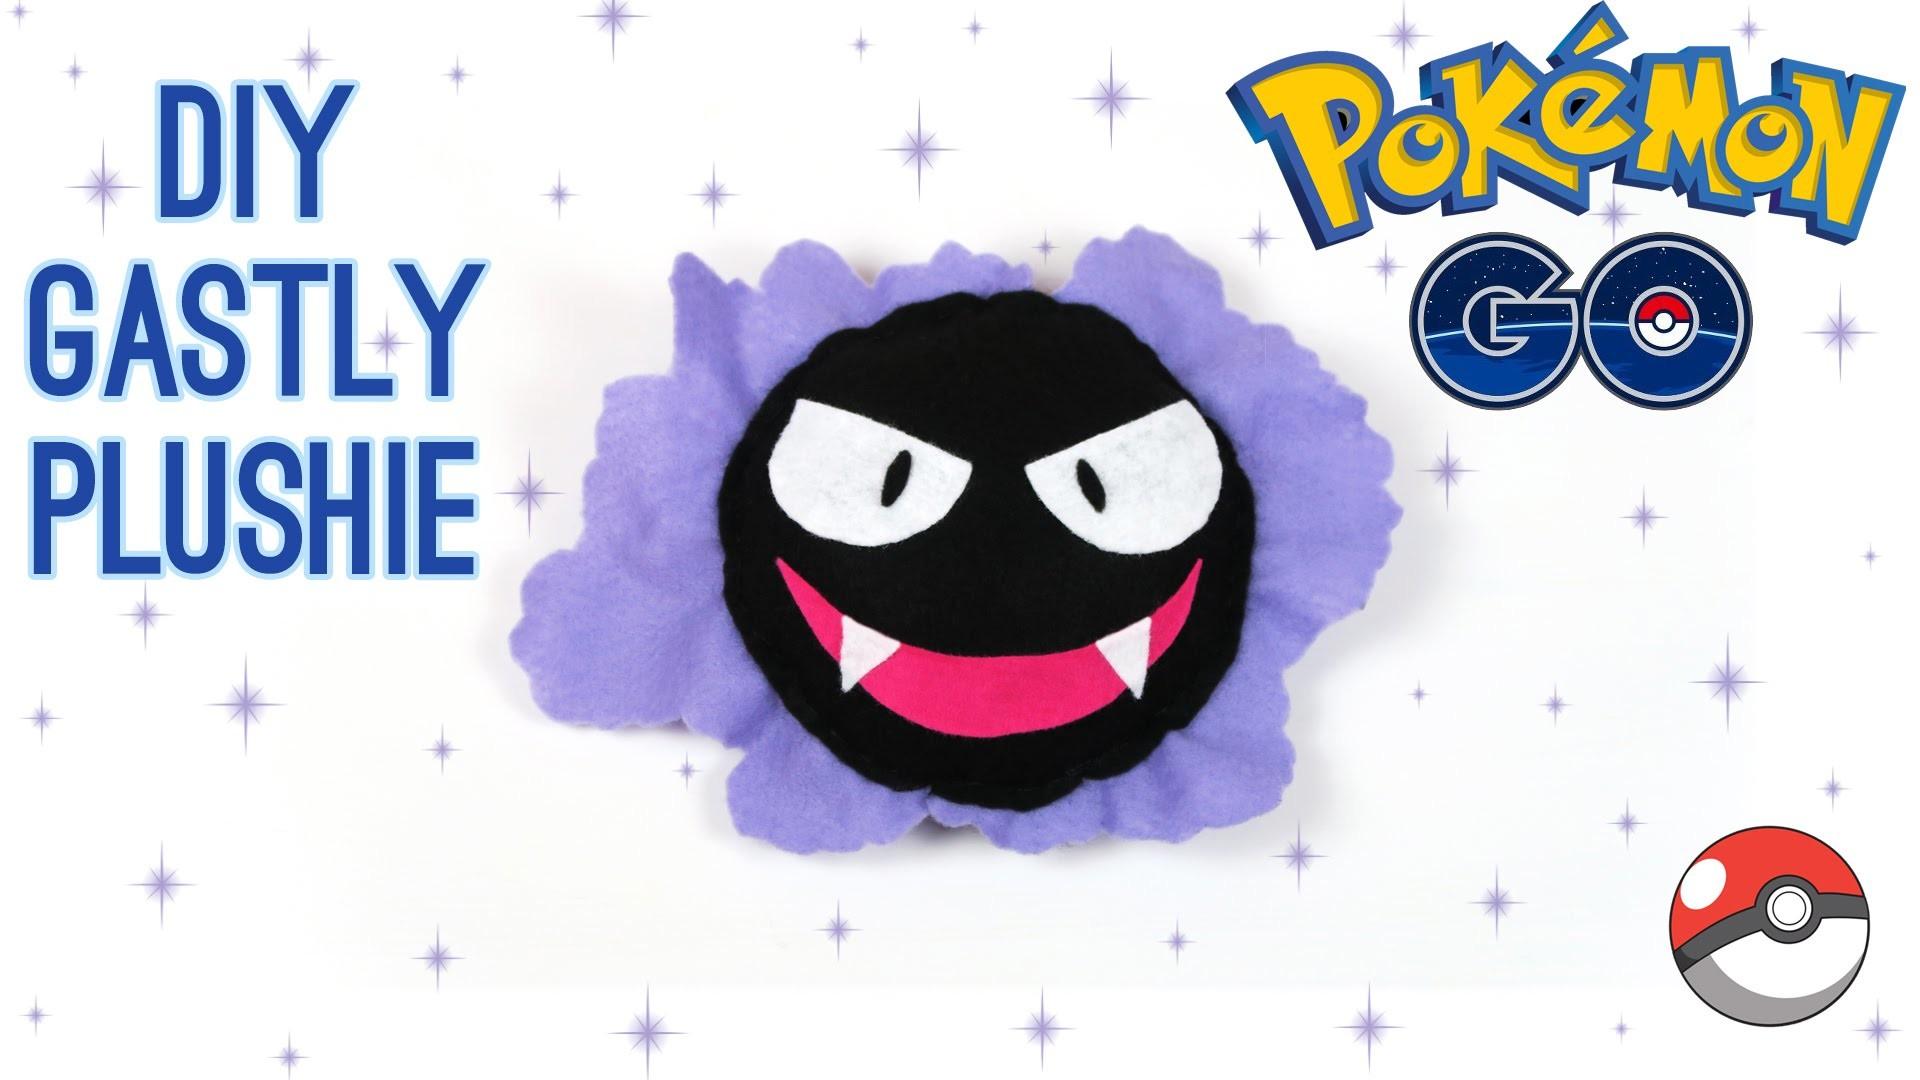 DIY Pokemon Gastly Plush: How to make your own cute Pokemon Go inspired plush toy